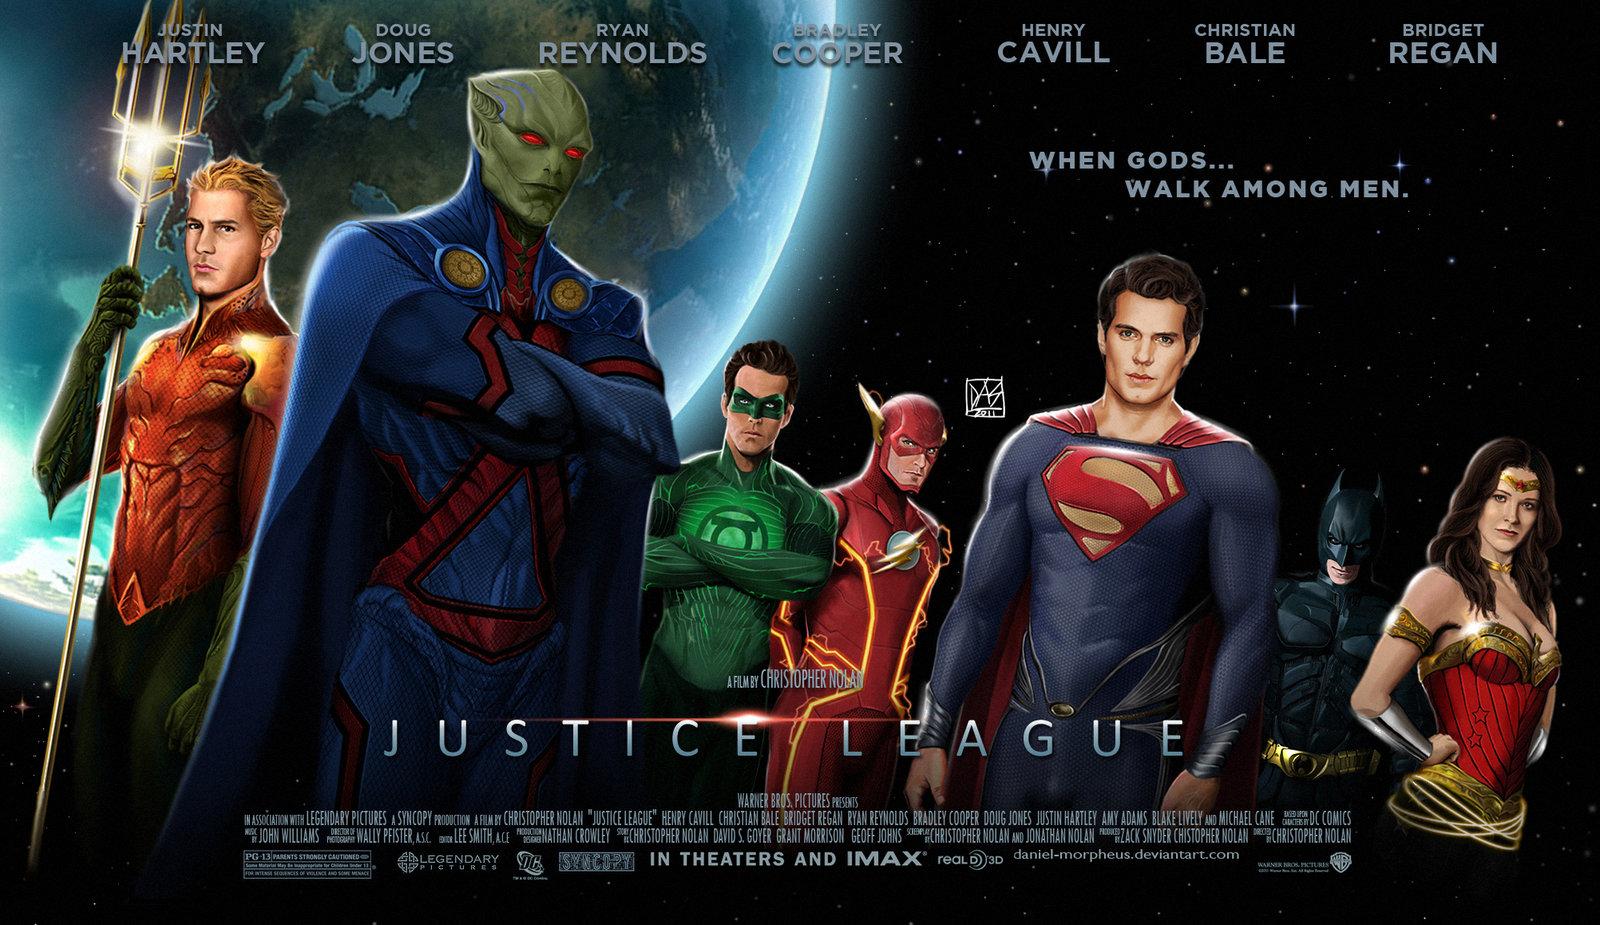 http://2.bp.blogspot.com/-7g8wZ6tiufs/T8jM8iBgTaI/AAAAAAAADhw/_2r24qwzb-8/s1600/justice_league_movie_poster_by_daniel_morpheus-d4ga8dj.jpg